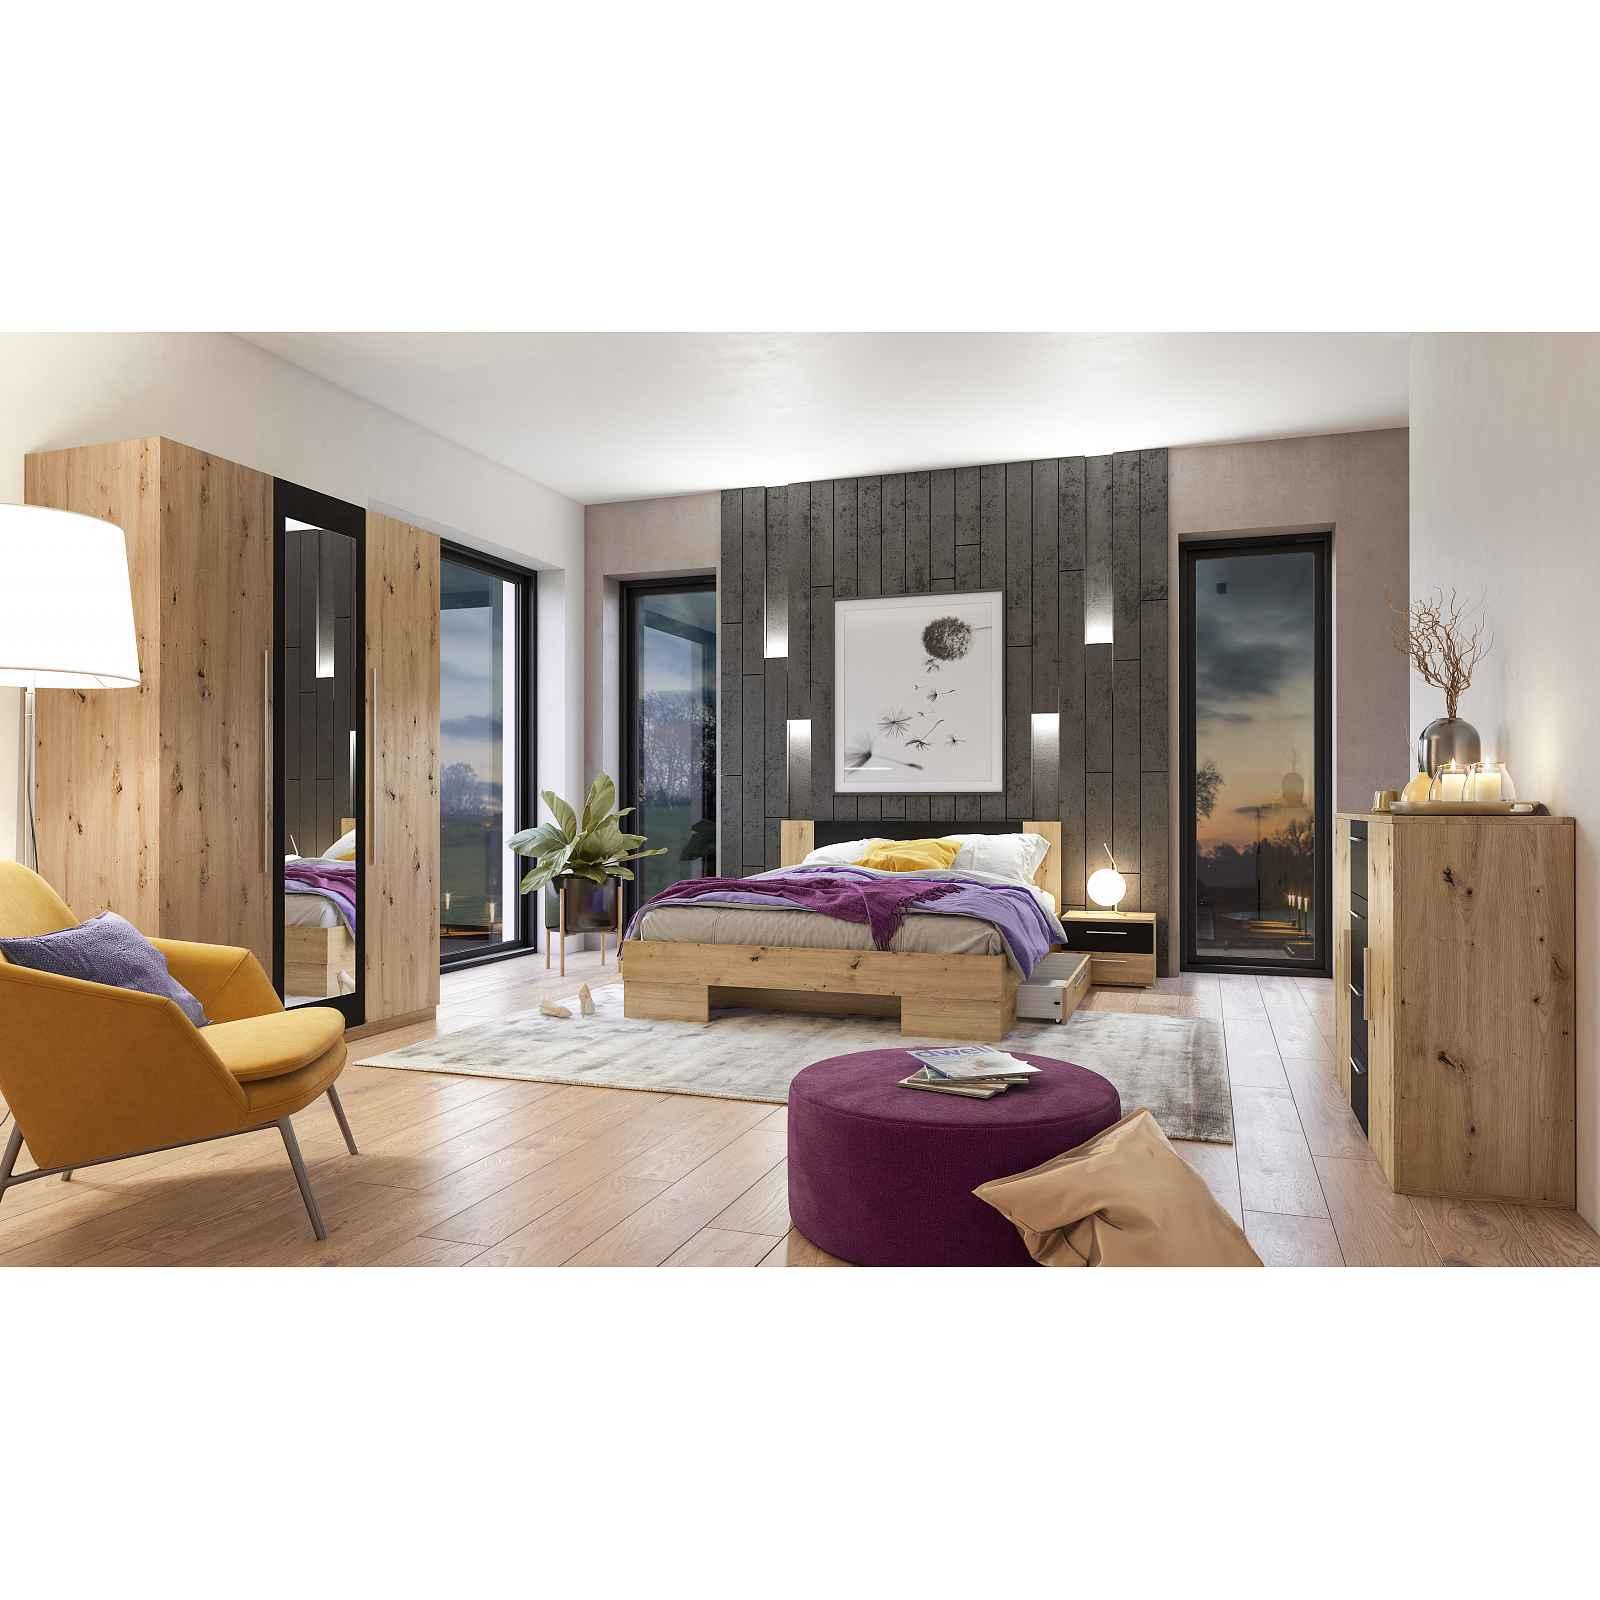 VERA II ložnice s postelí 180x200 cm, dub artisan/černá